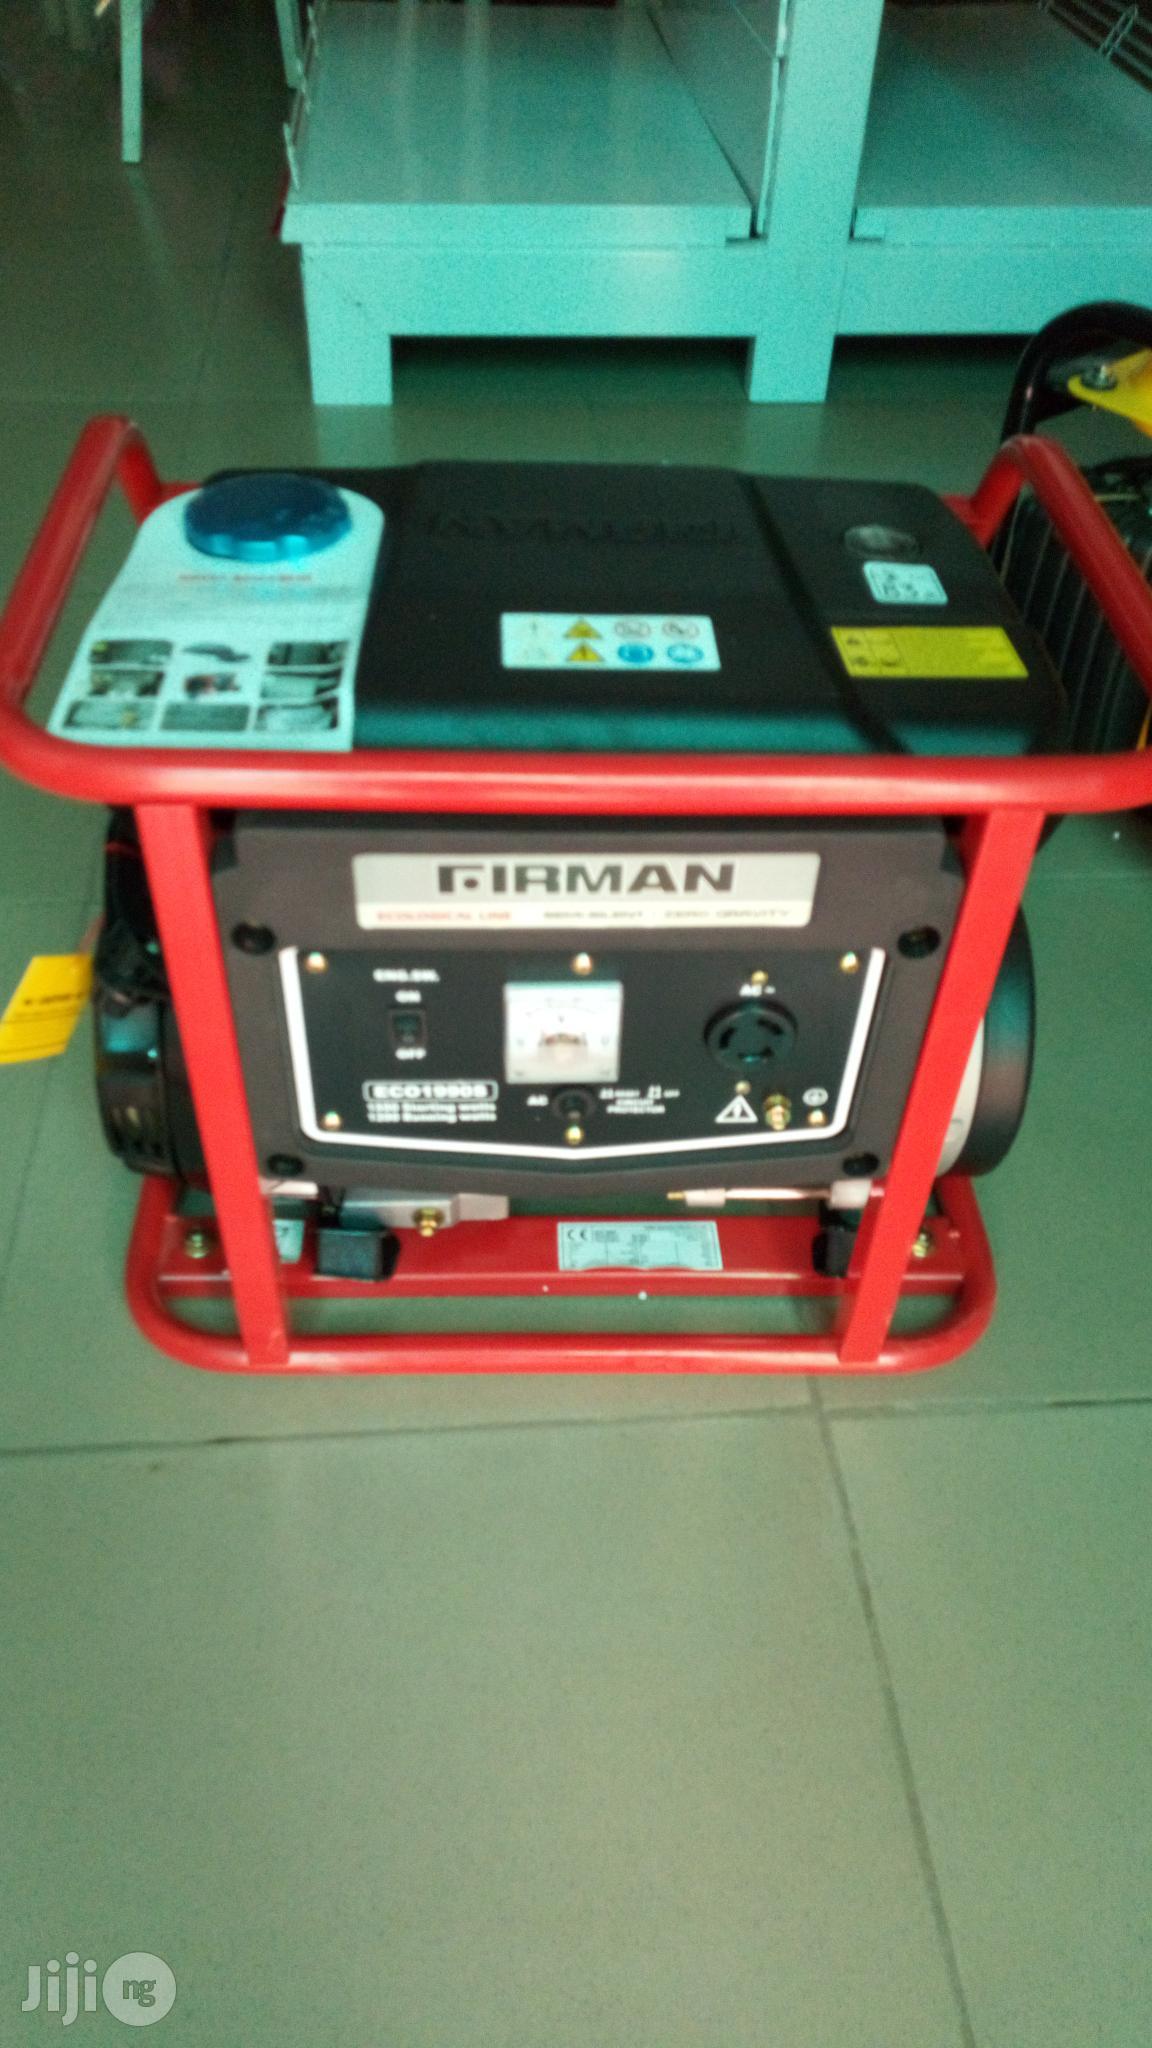 Firman ECO 1990S Petrol Generator